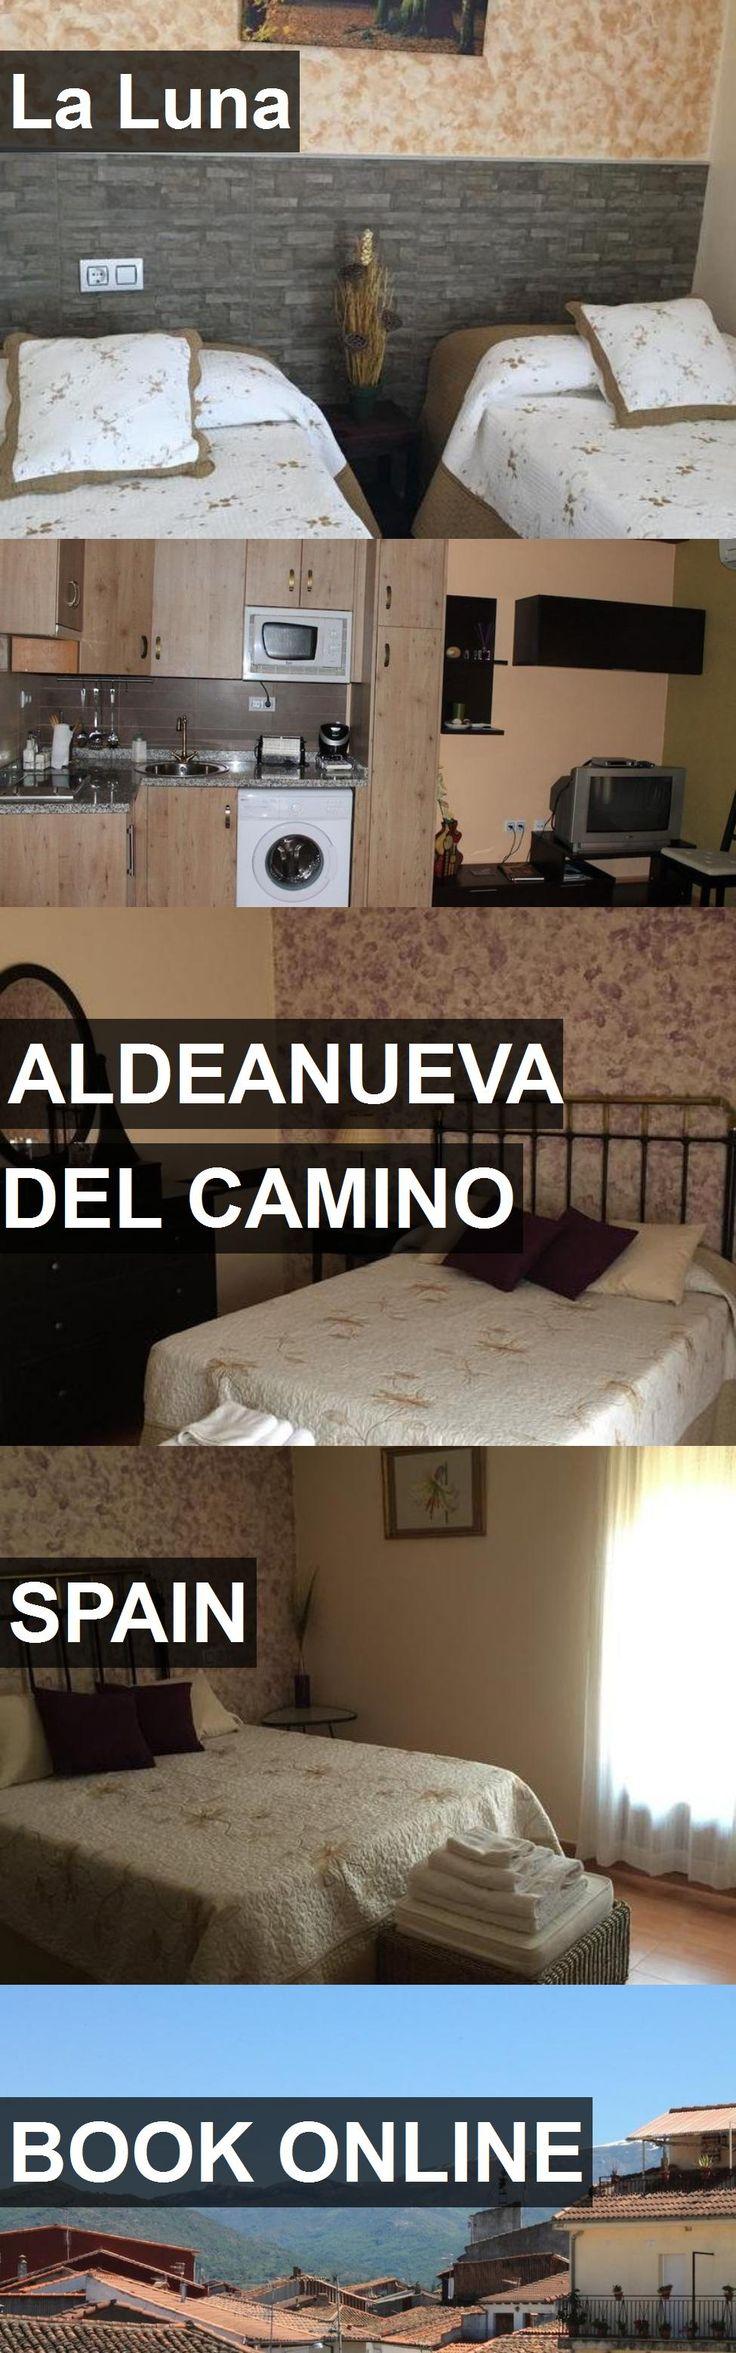 Hotel La Luna in Aldeanueva del Camino, Spain. For more information, photos, reviews and best prices please follow the link. #Spain #AldeanuevadelCamino #travel #vacation #hotel